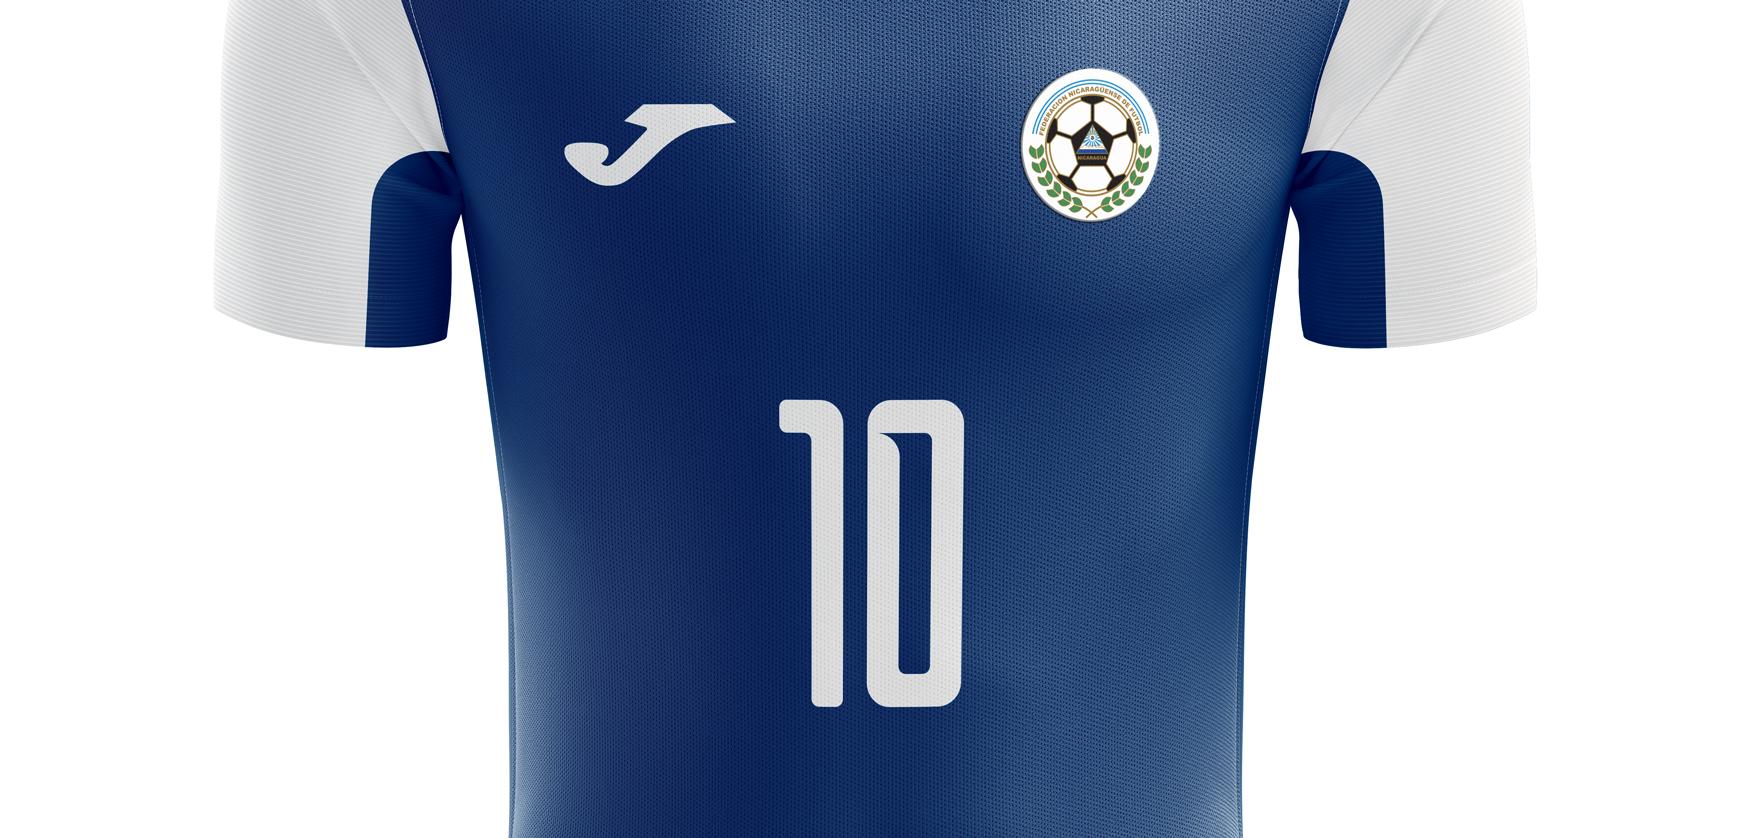 Blue-jersey.jpg